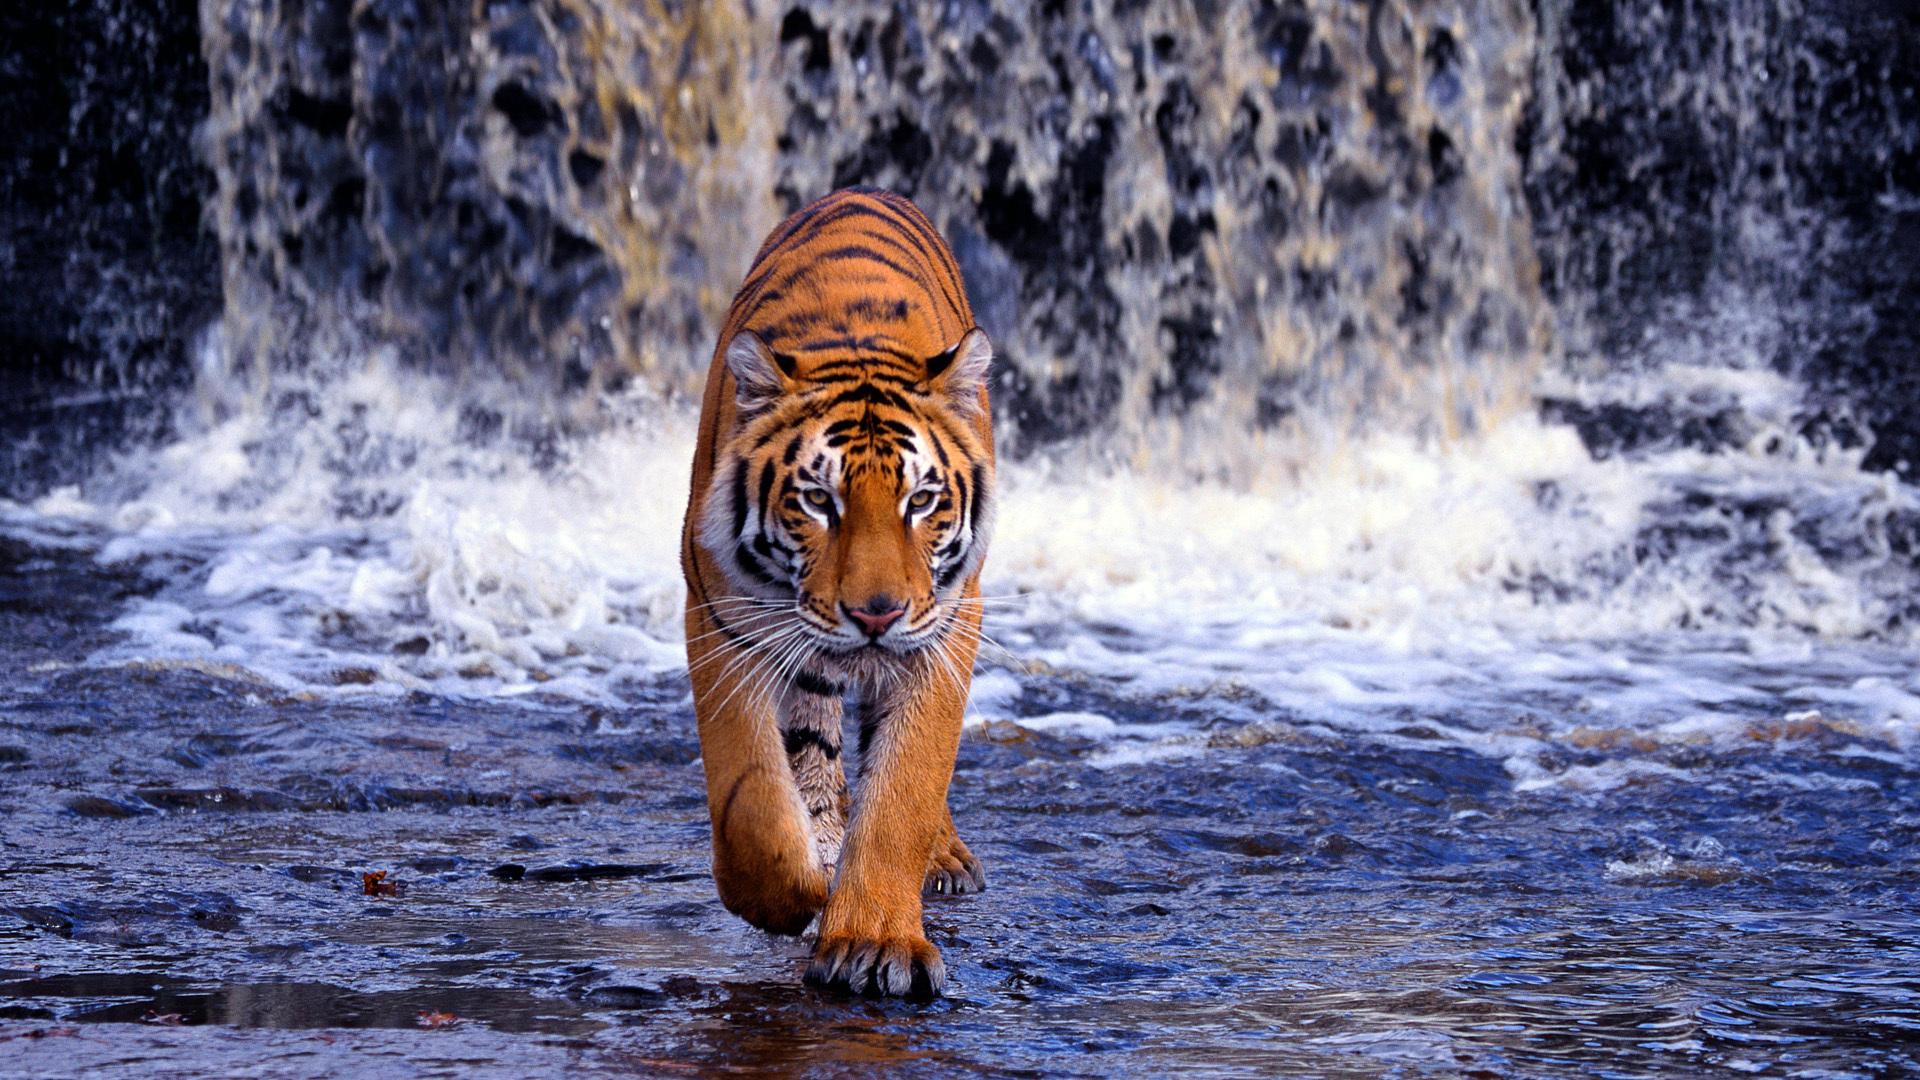 Fotos de portada tigres 26